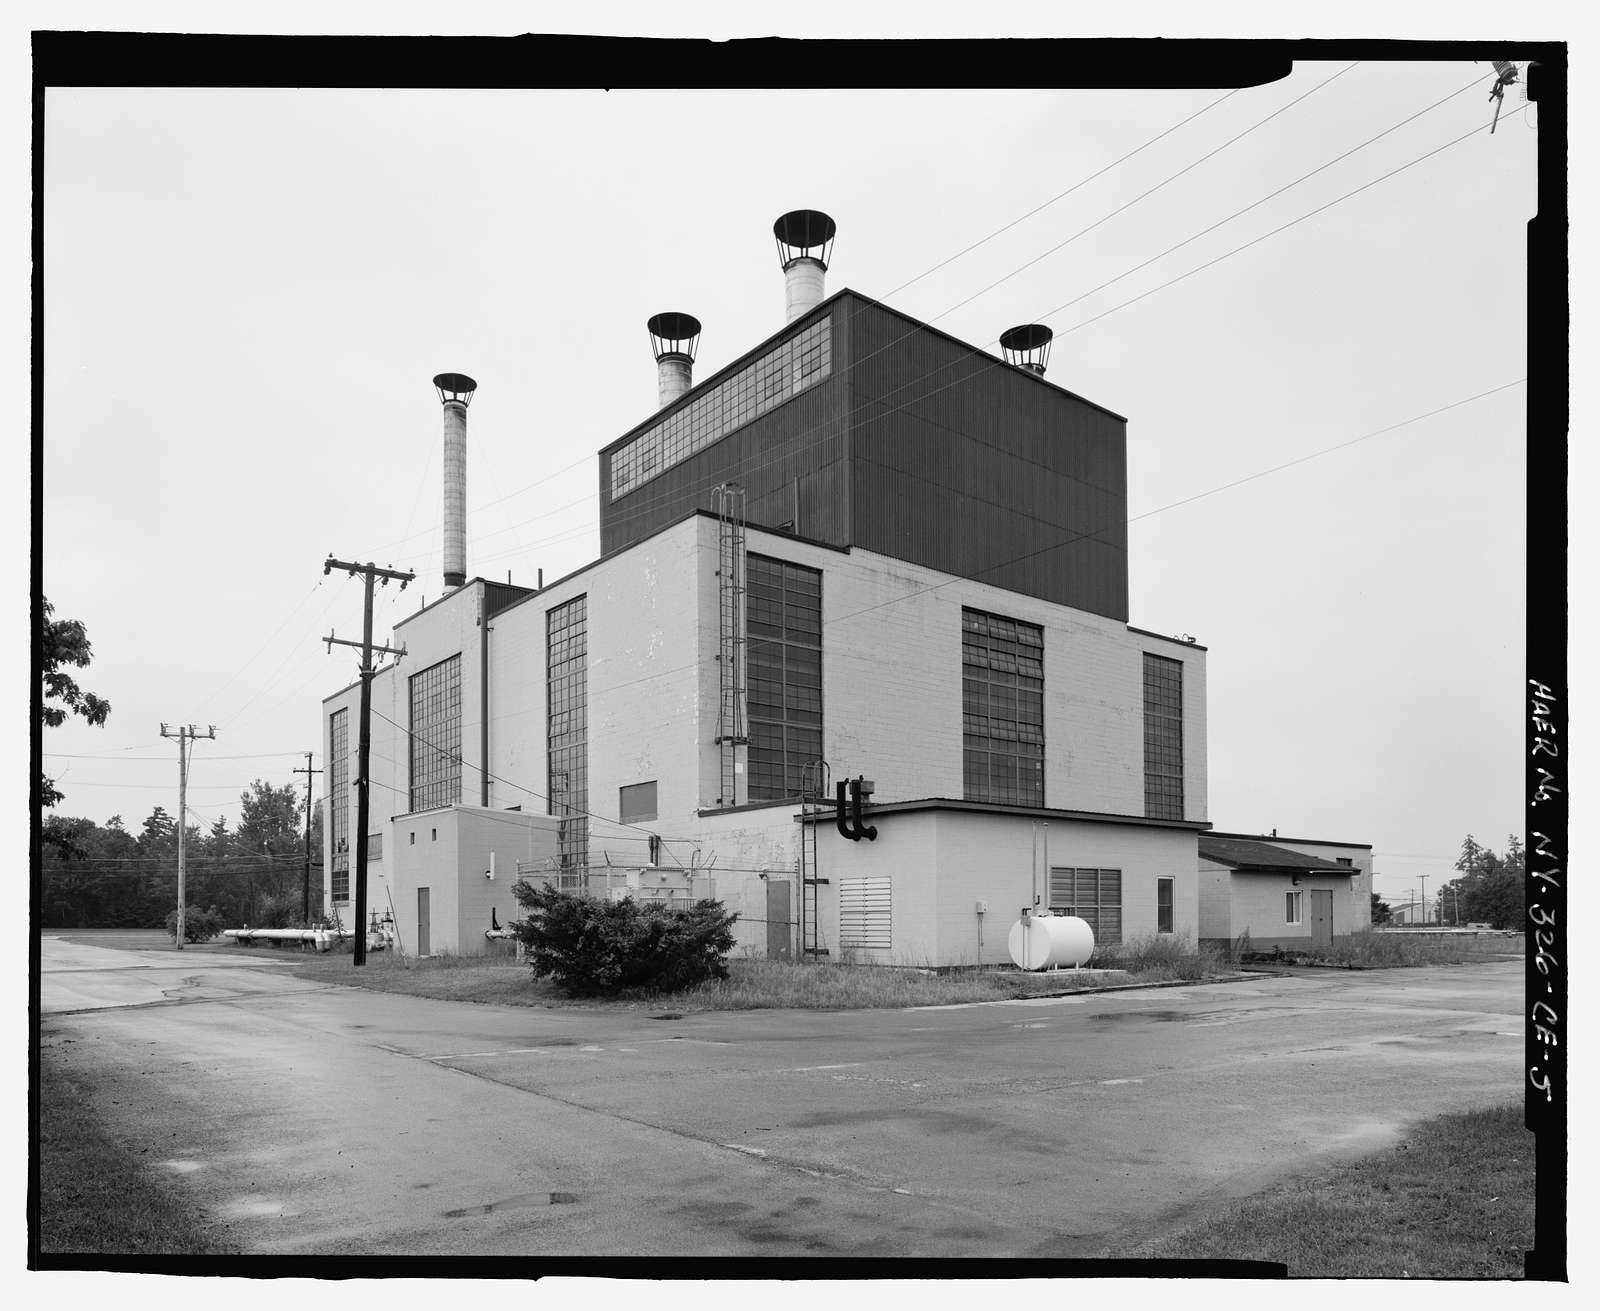 Plattsburgh Air Force Base, Heating Facility, New York Road, Plattsburgh, Clinton County, NY